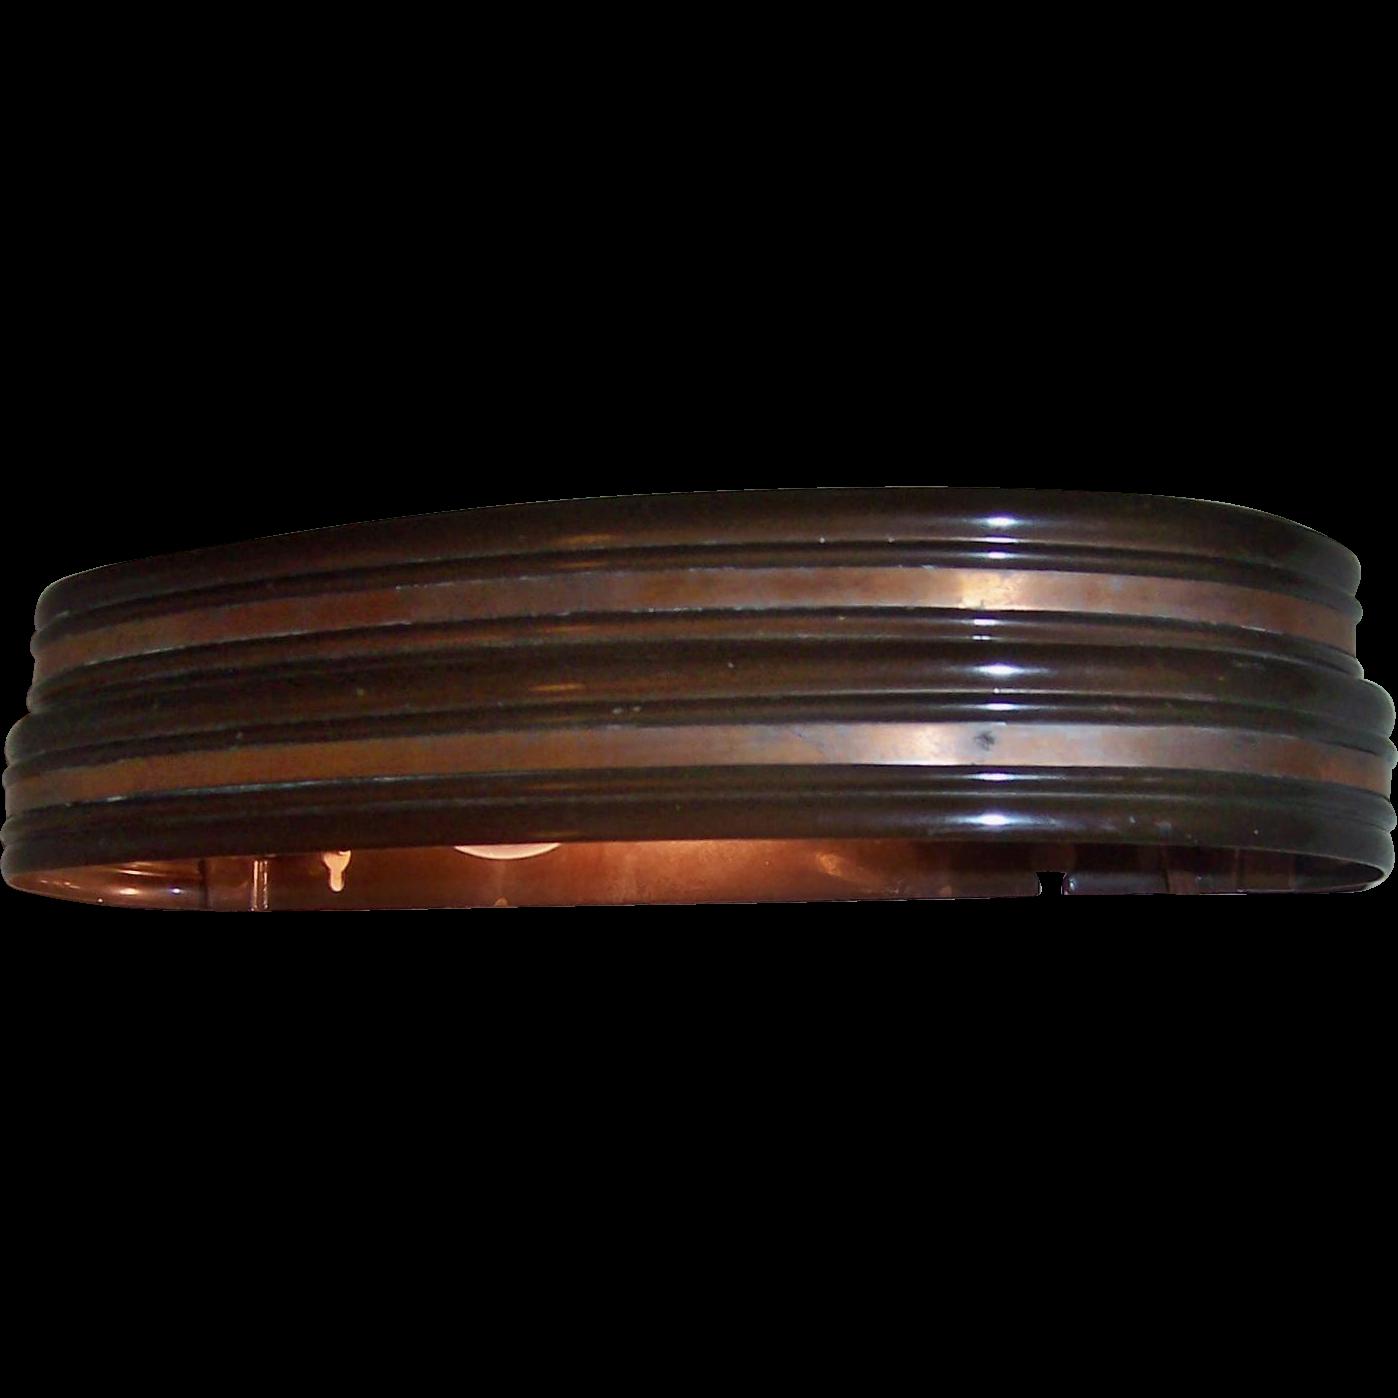 Art Deco Electrolite Wall / Headboard Lamp Brown & Copper Trim